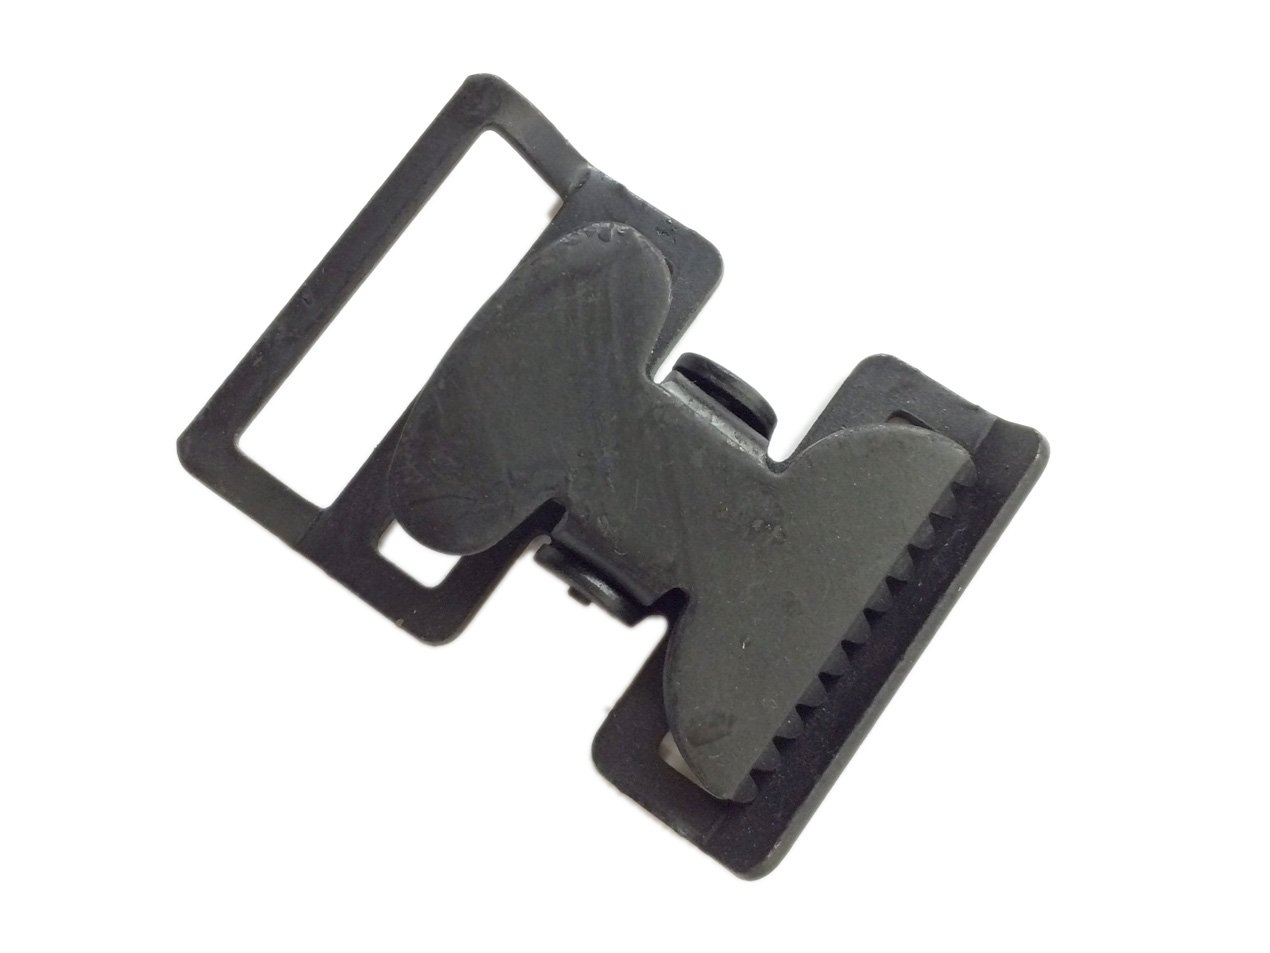 T-Buckle - 1-1/2 inch - Black